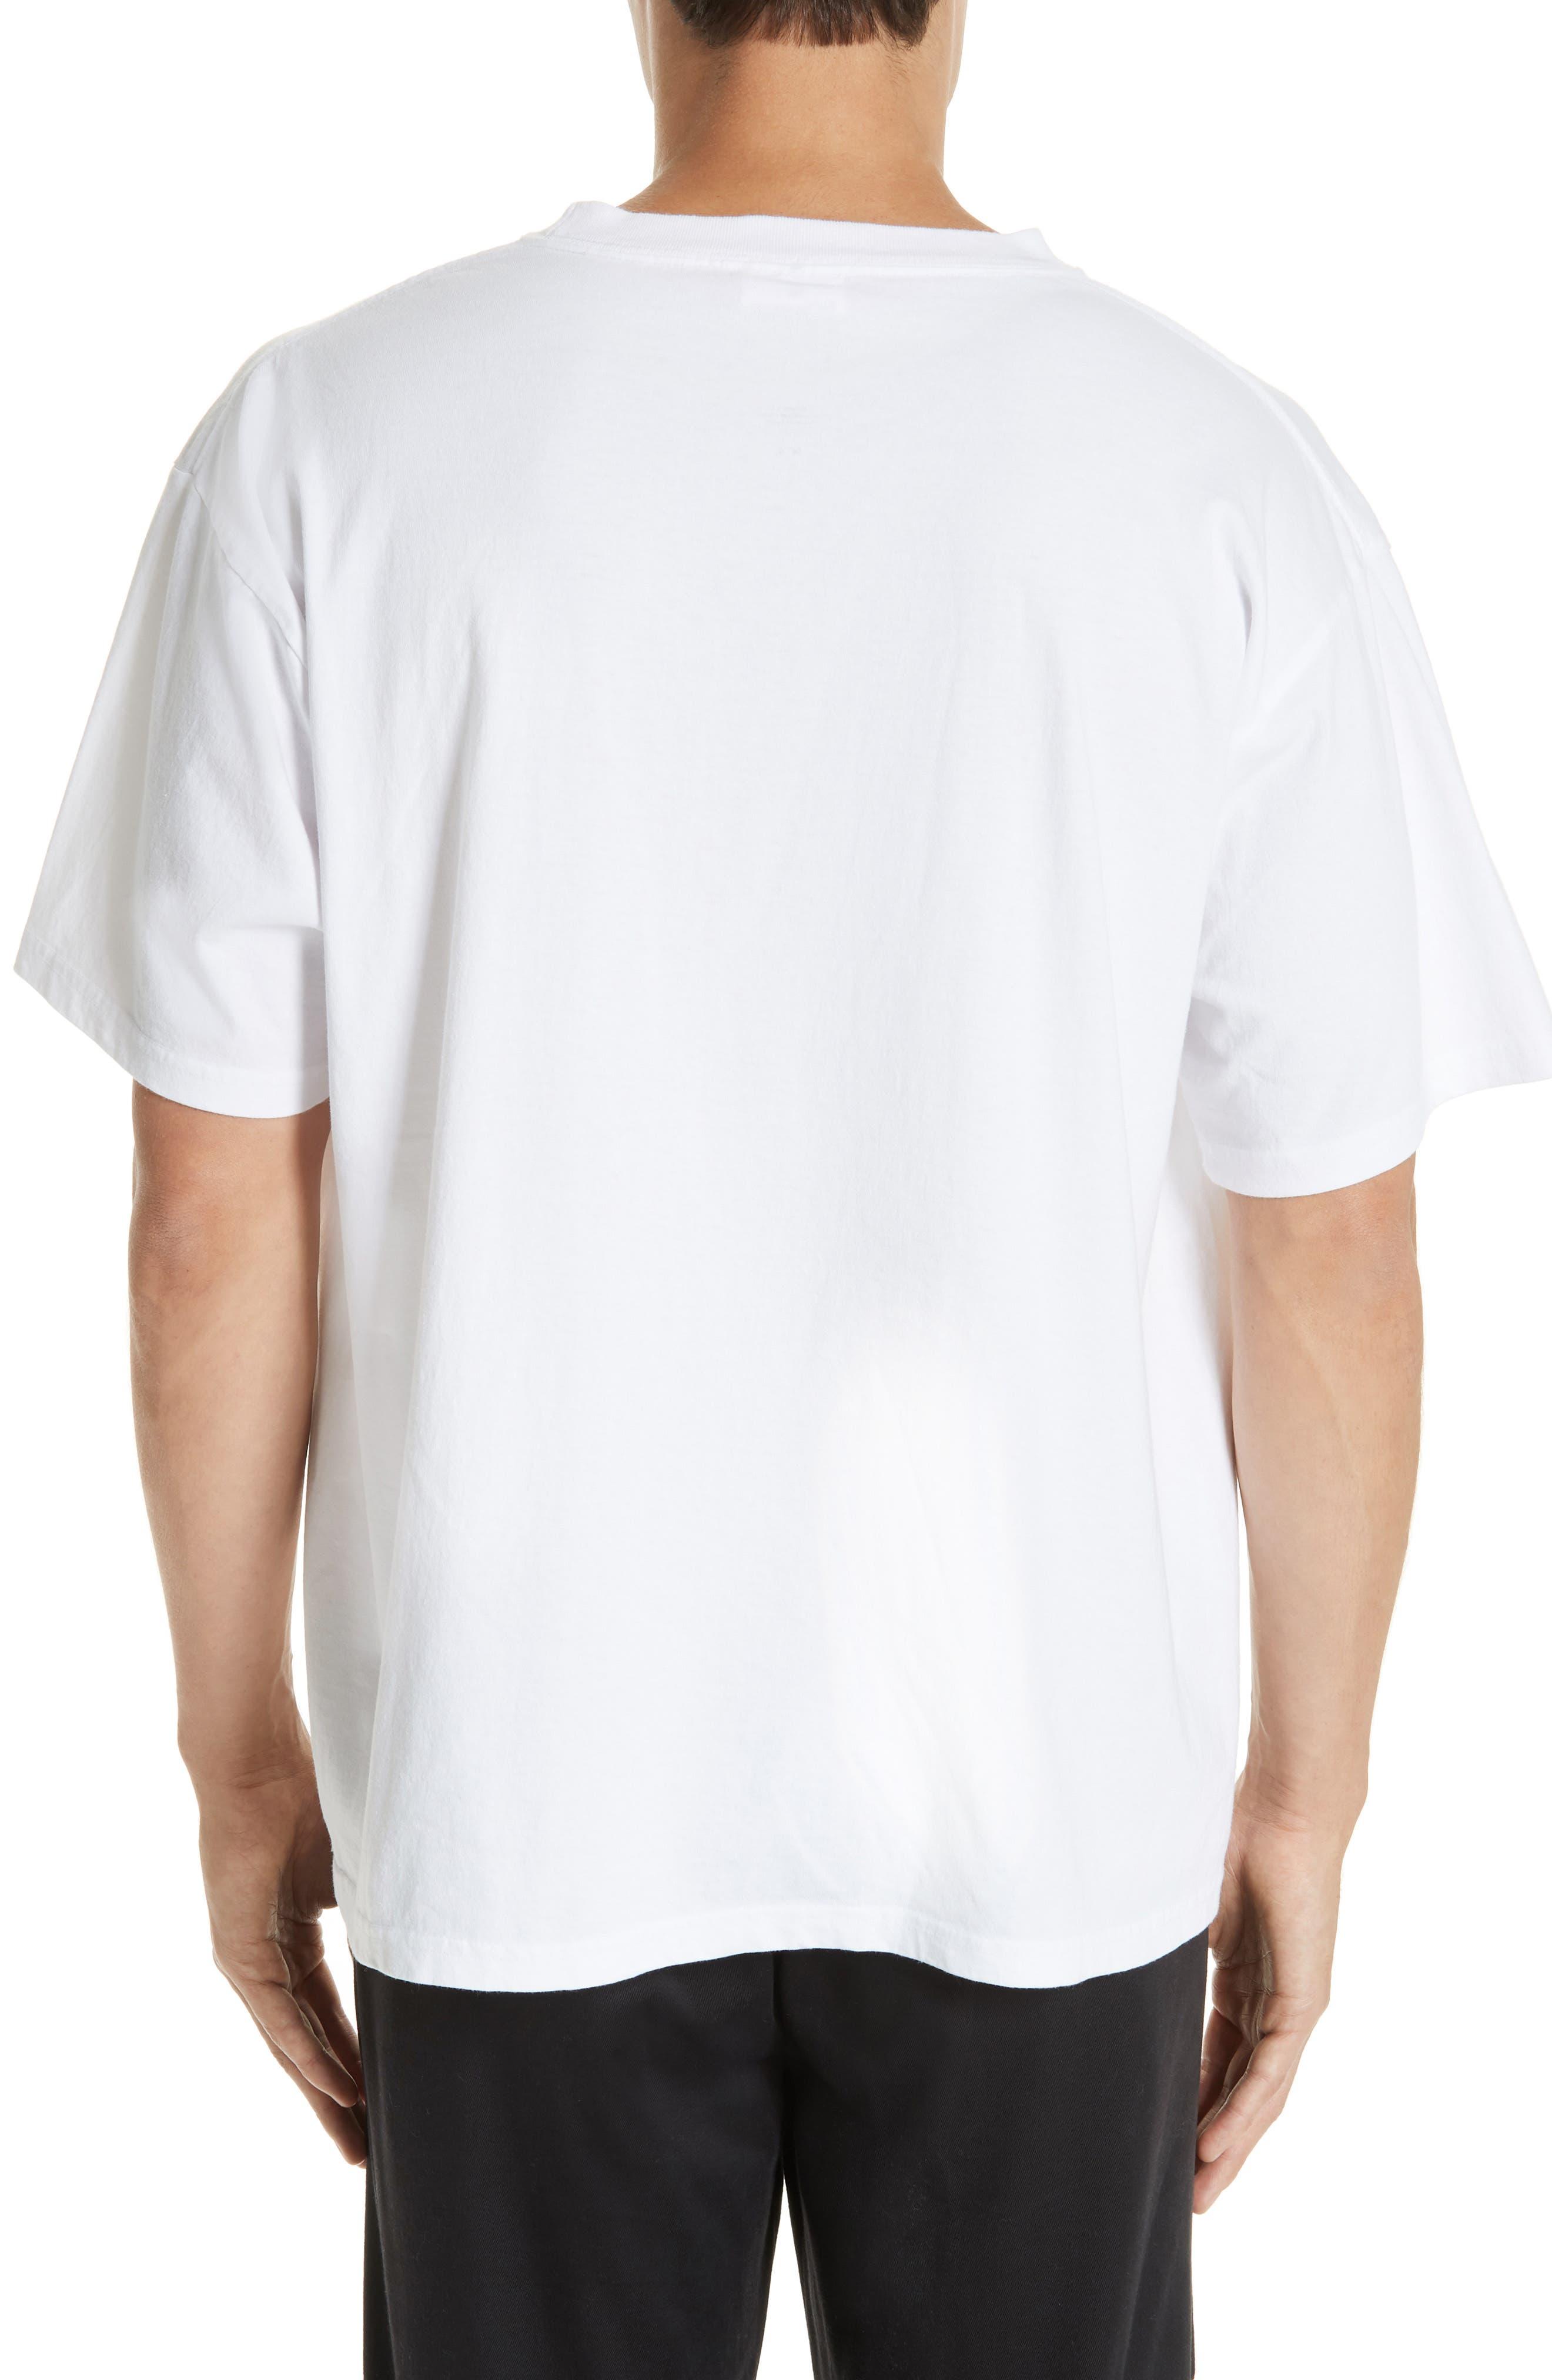 Slater Graphic T-Shirt,                             Alternate thumbnail 2, color,                             WHITE